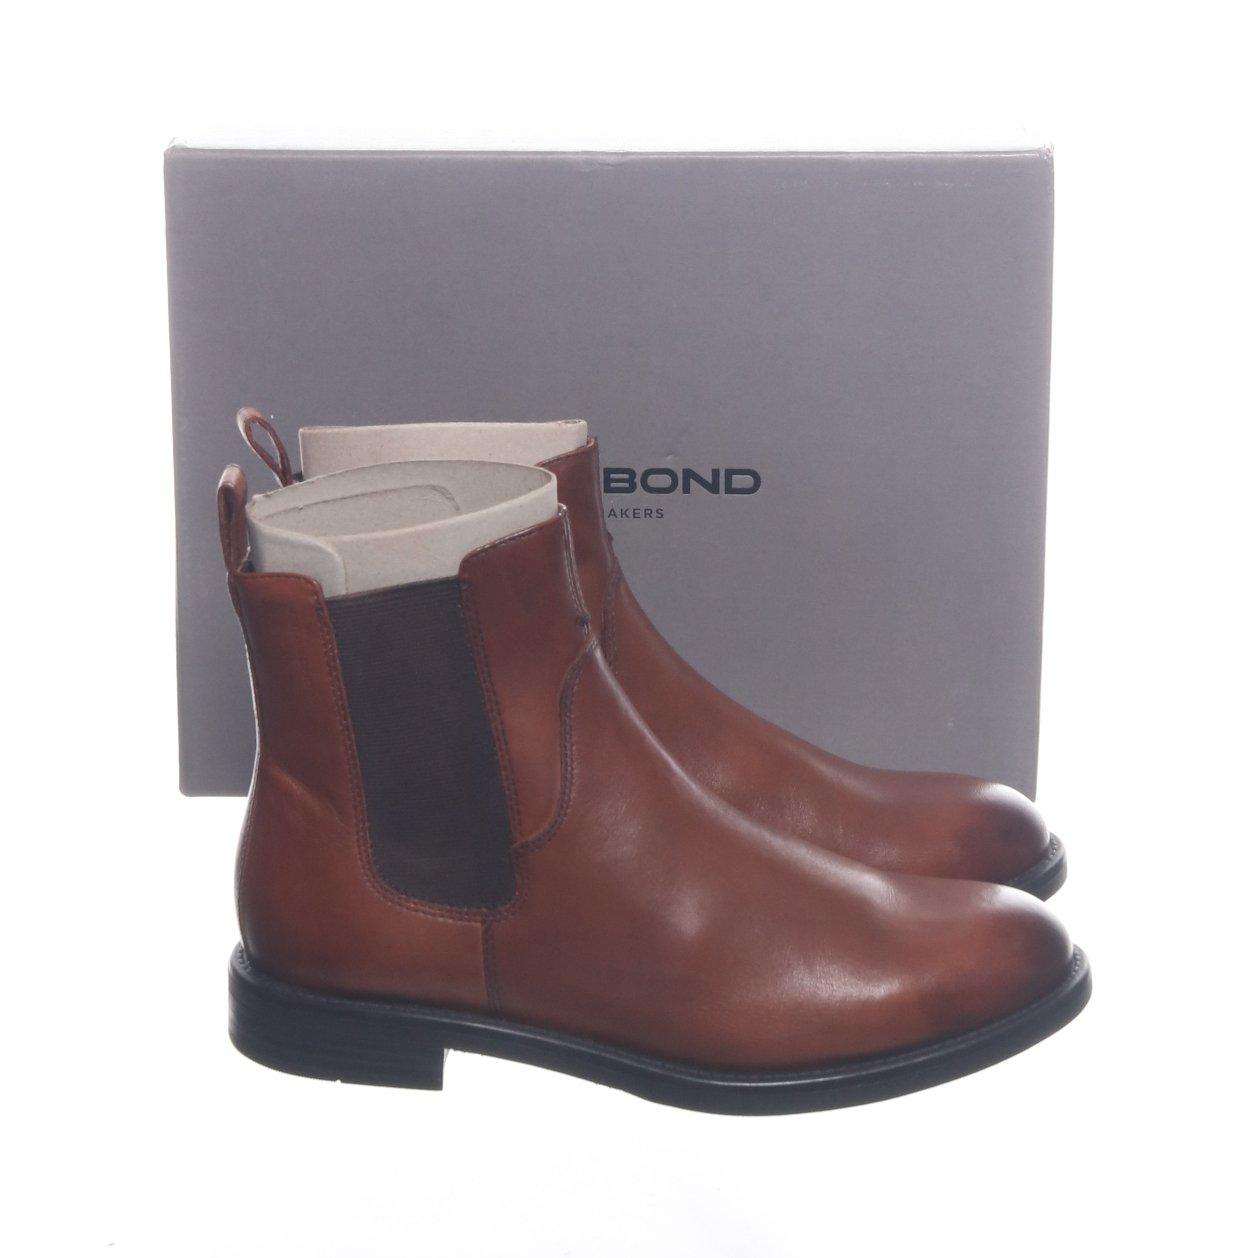 Vagabond, Boots, Strl: 37, Amina, Brun, Skinn